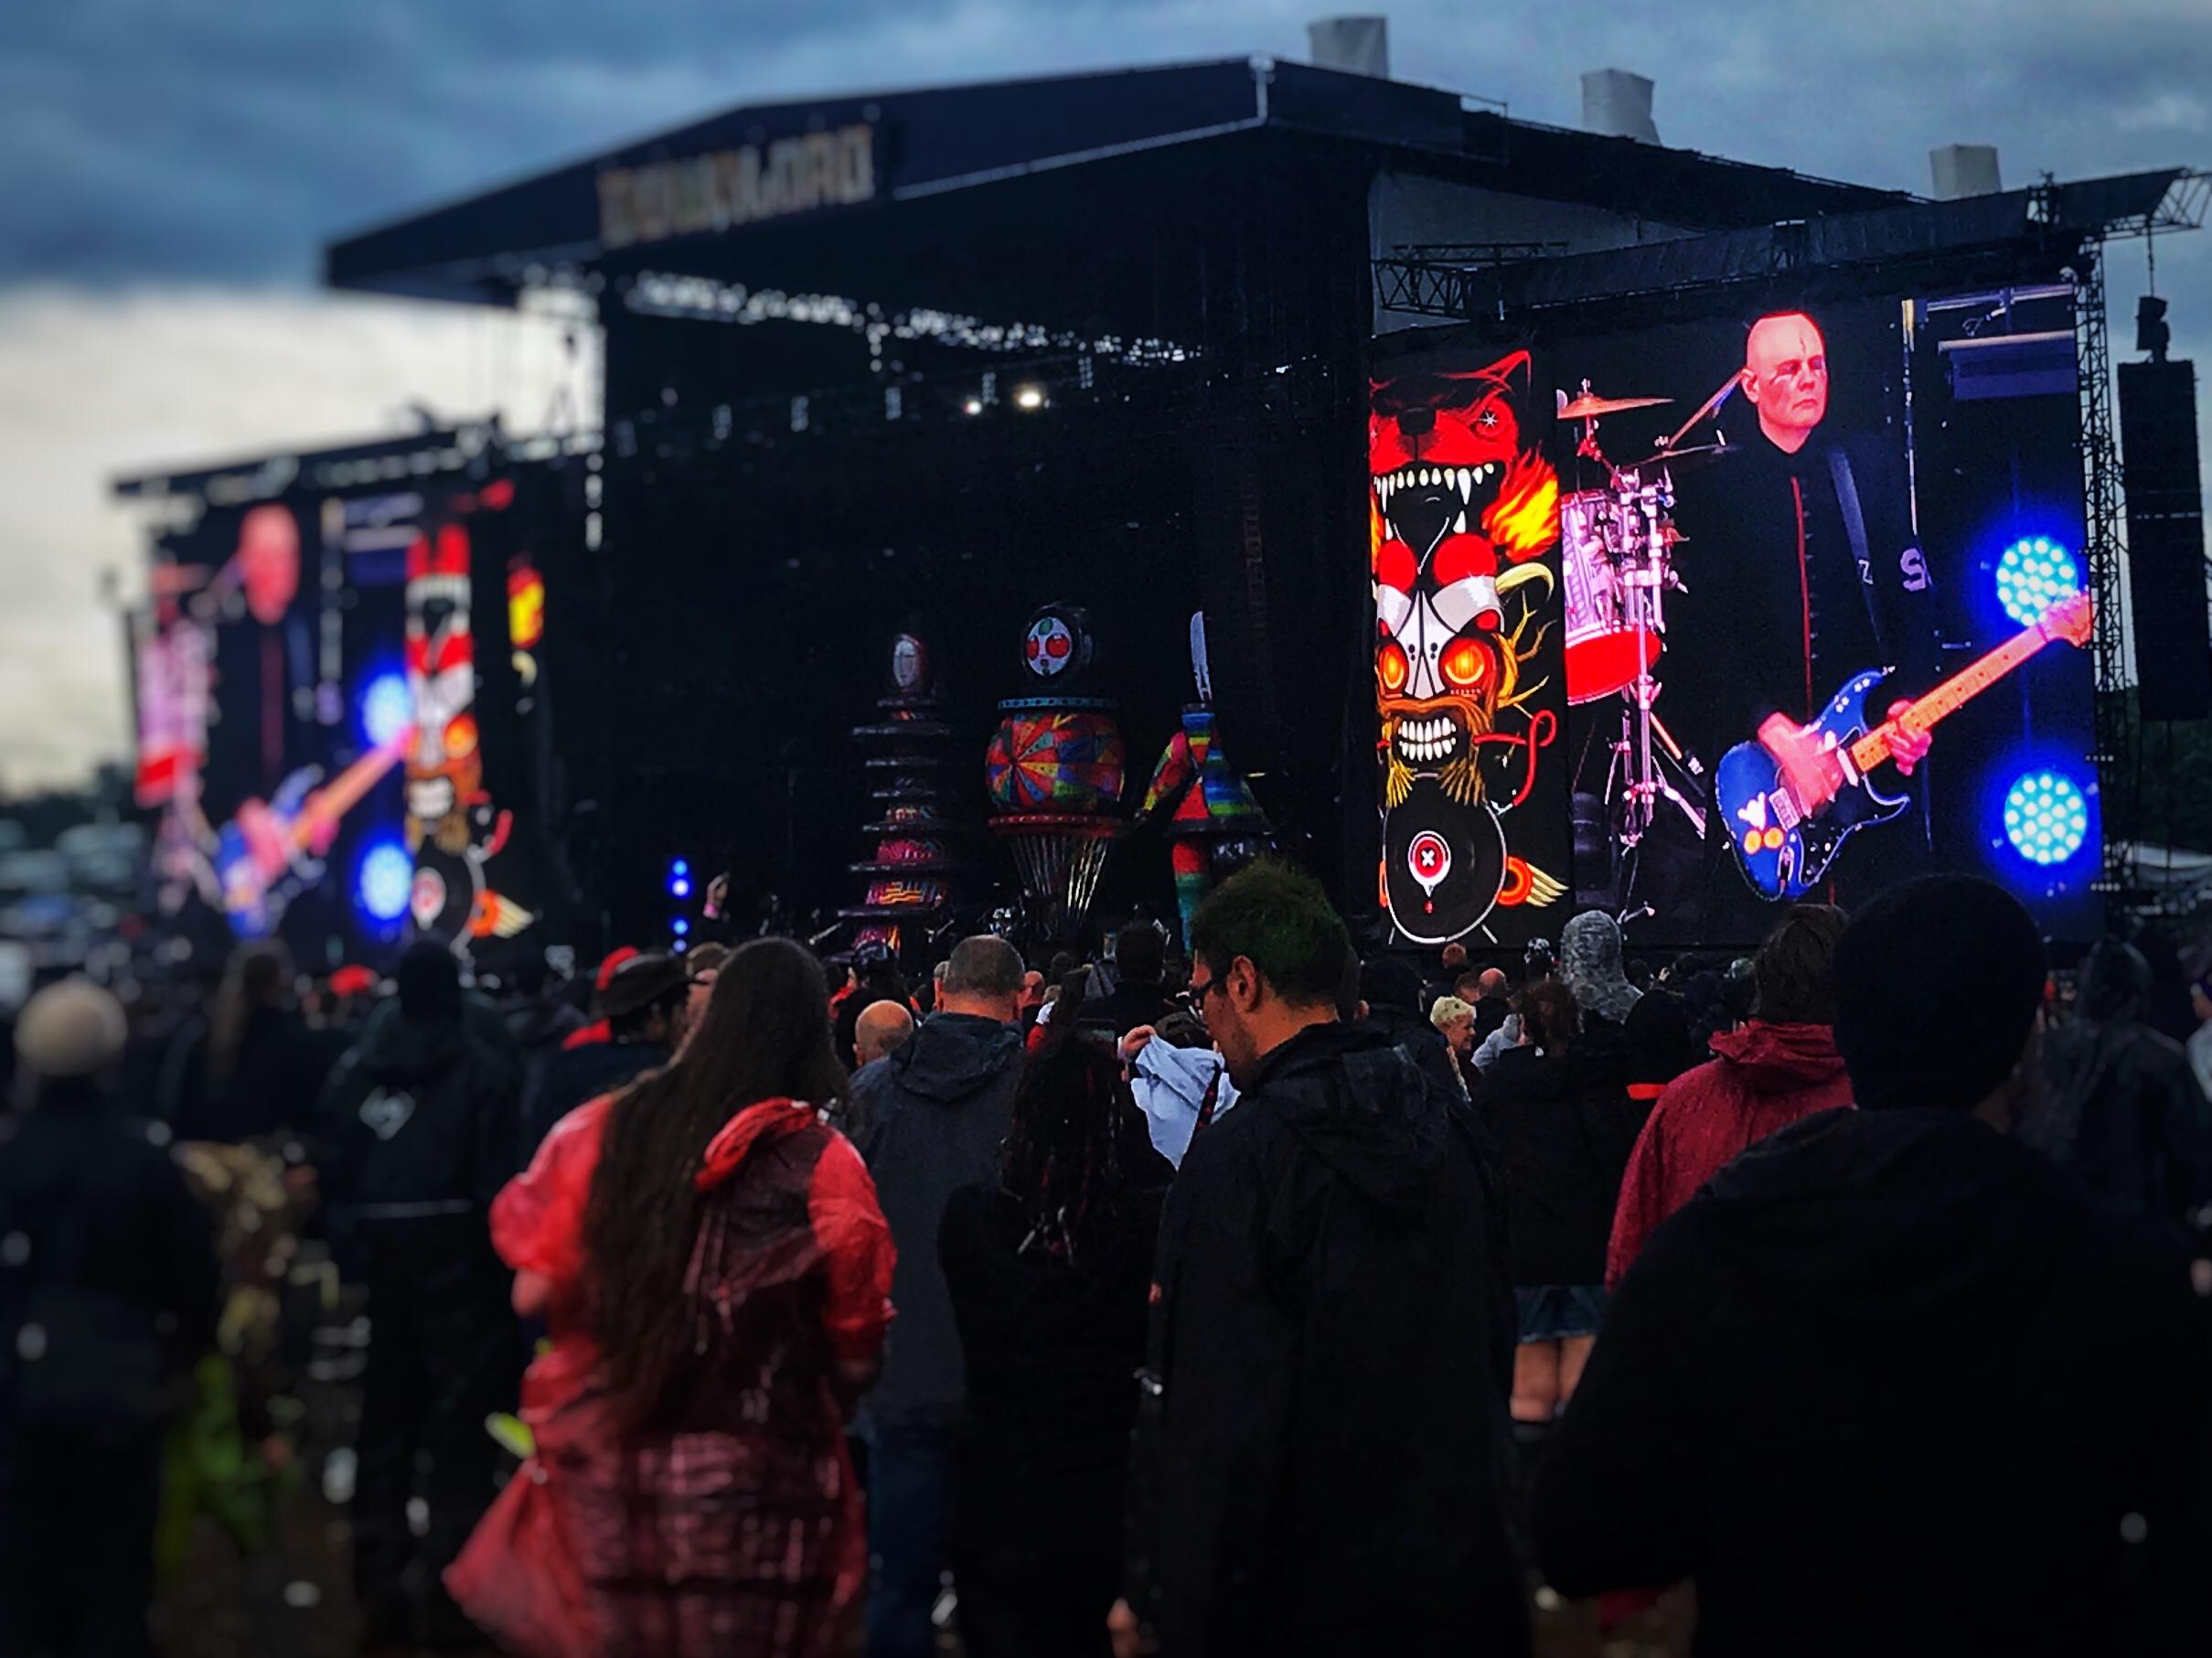 Smashing Pumpkins - Billy Corgan delivering the goods